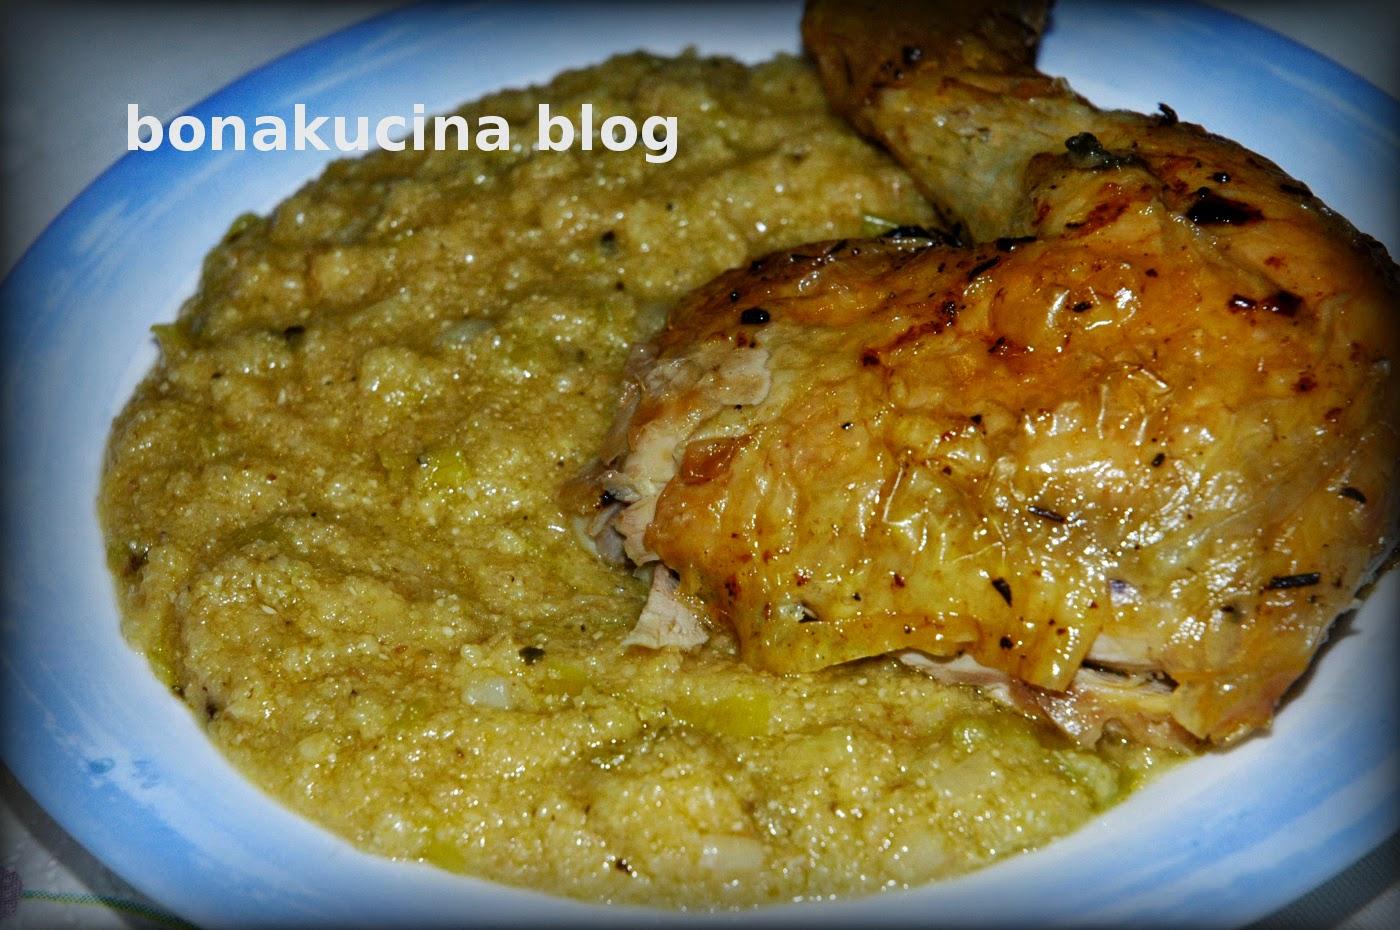 Eccezionale Bona Kucina: Pershesh me buke misri (cucina albanese) JN87